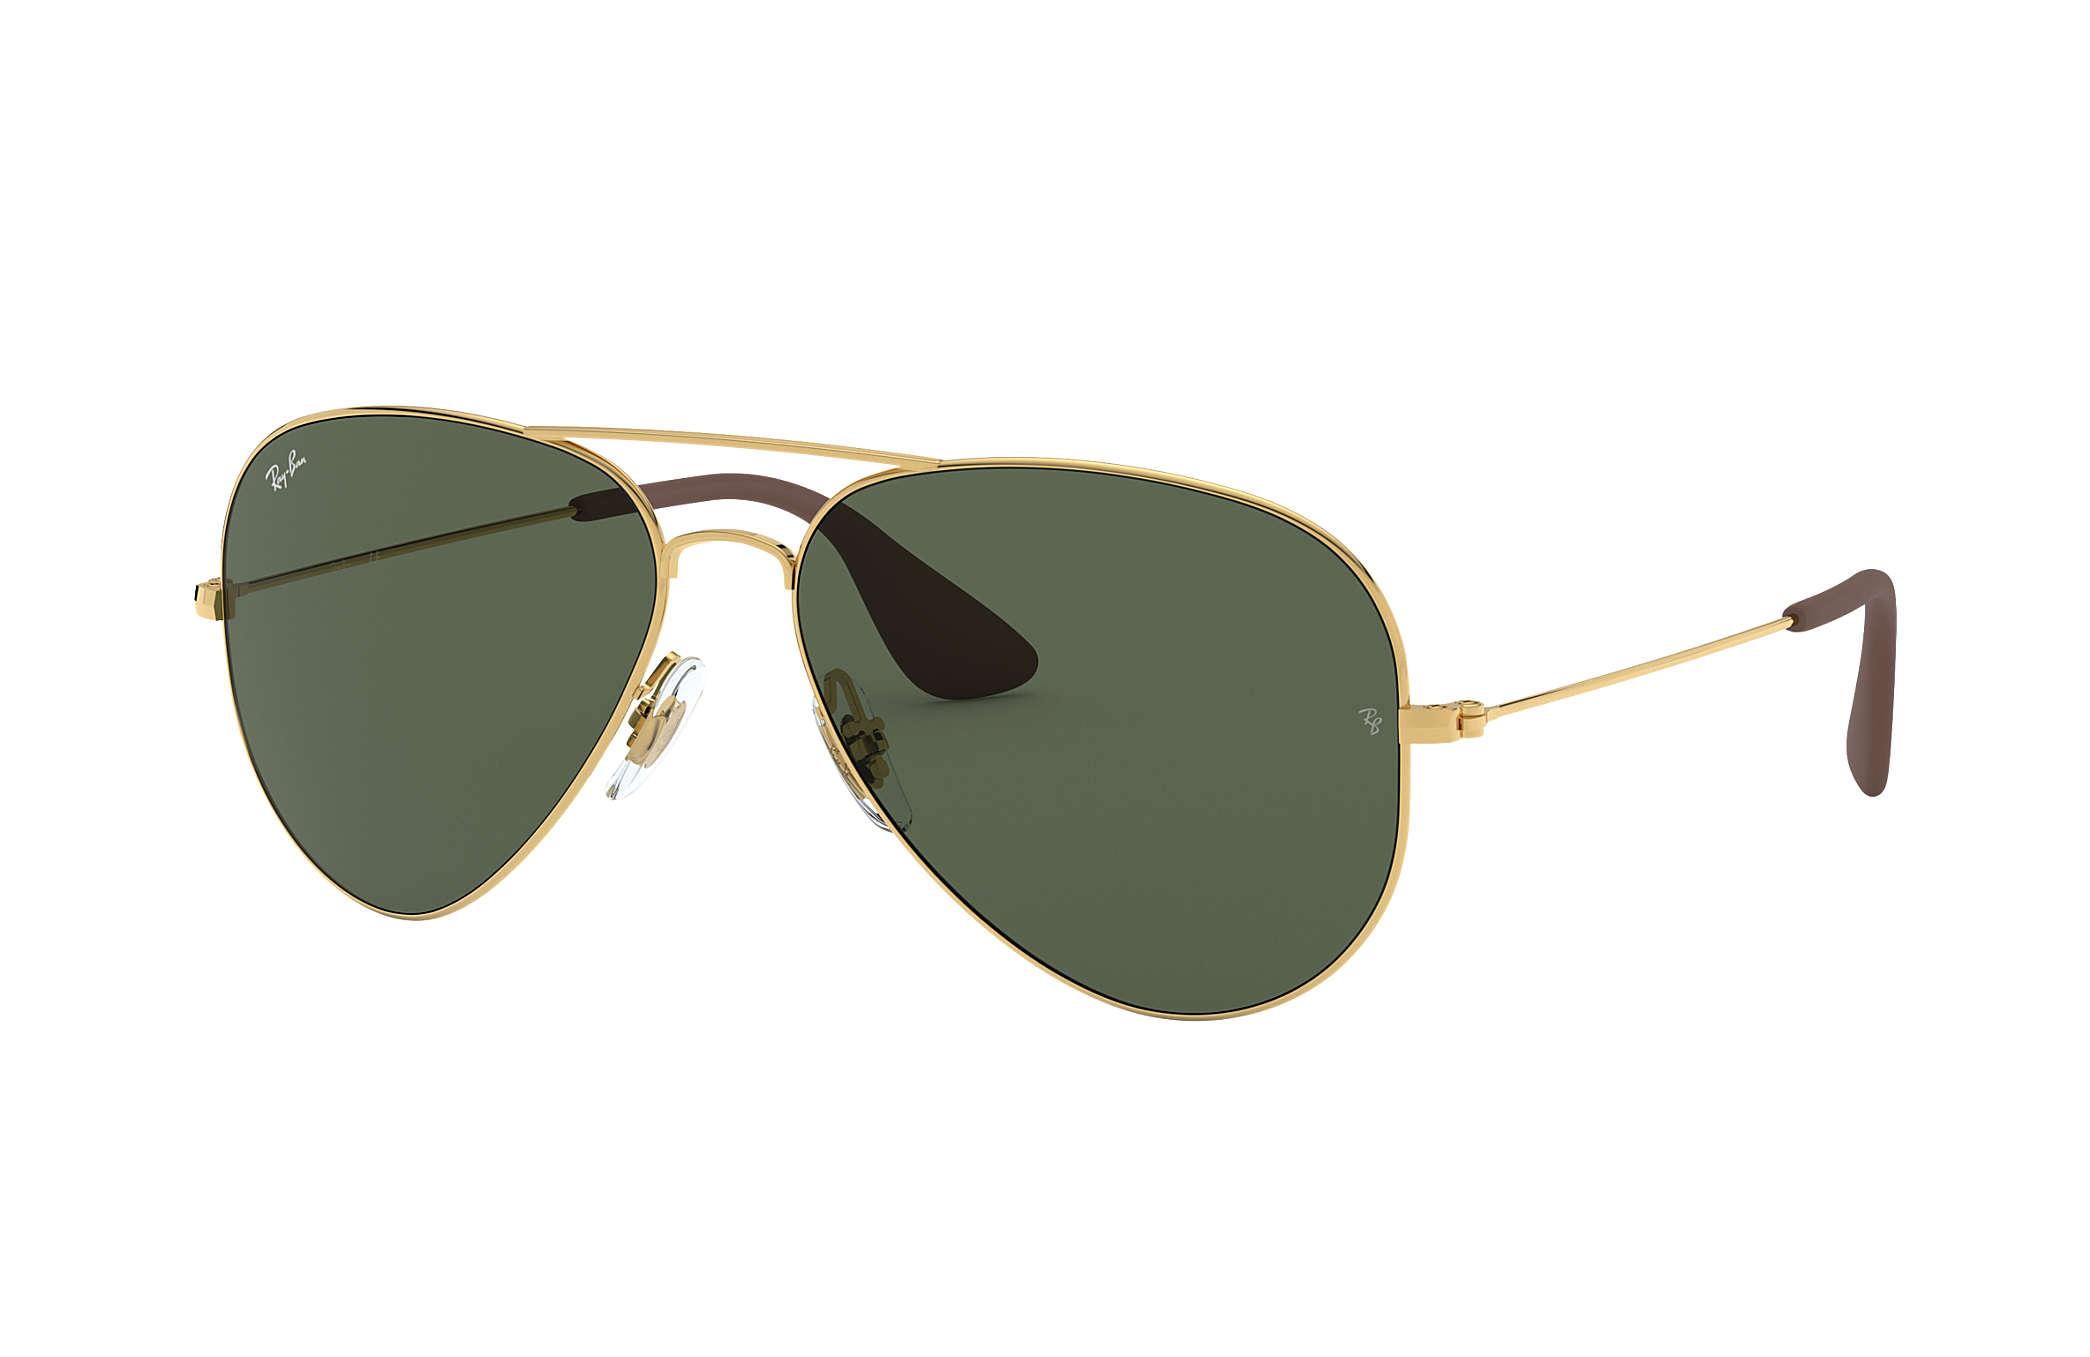 7d9d4282a8 Ray-Ban RB3558 Gold - Metal - Green Lenses - 0RB3558001 7158